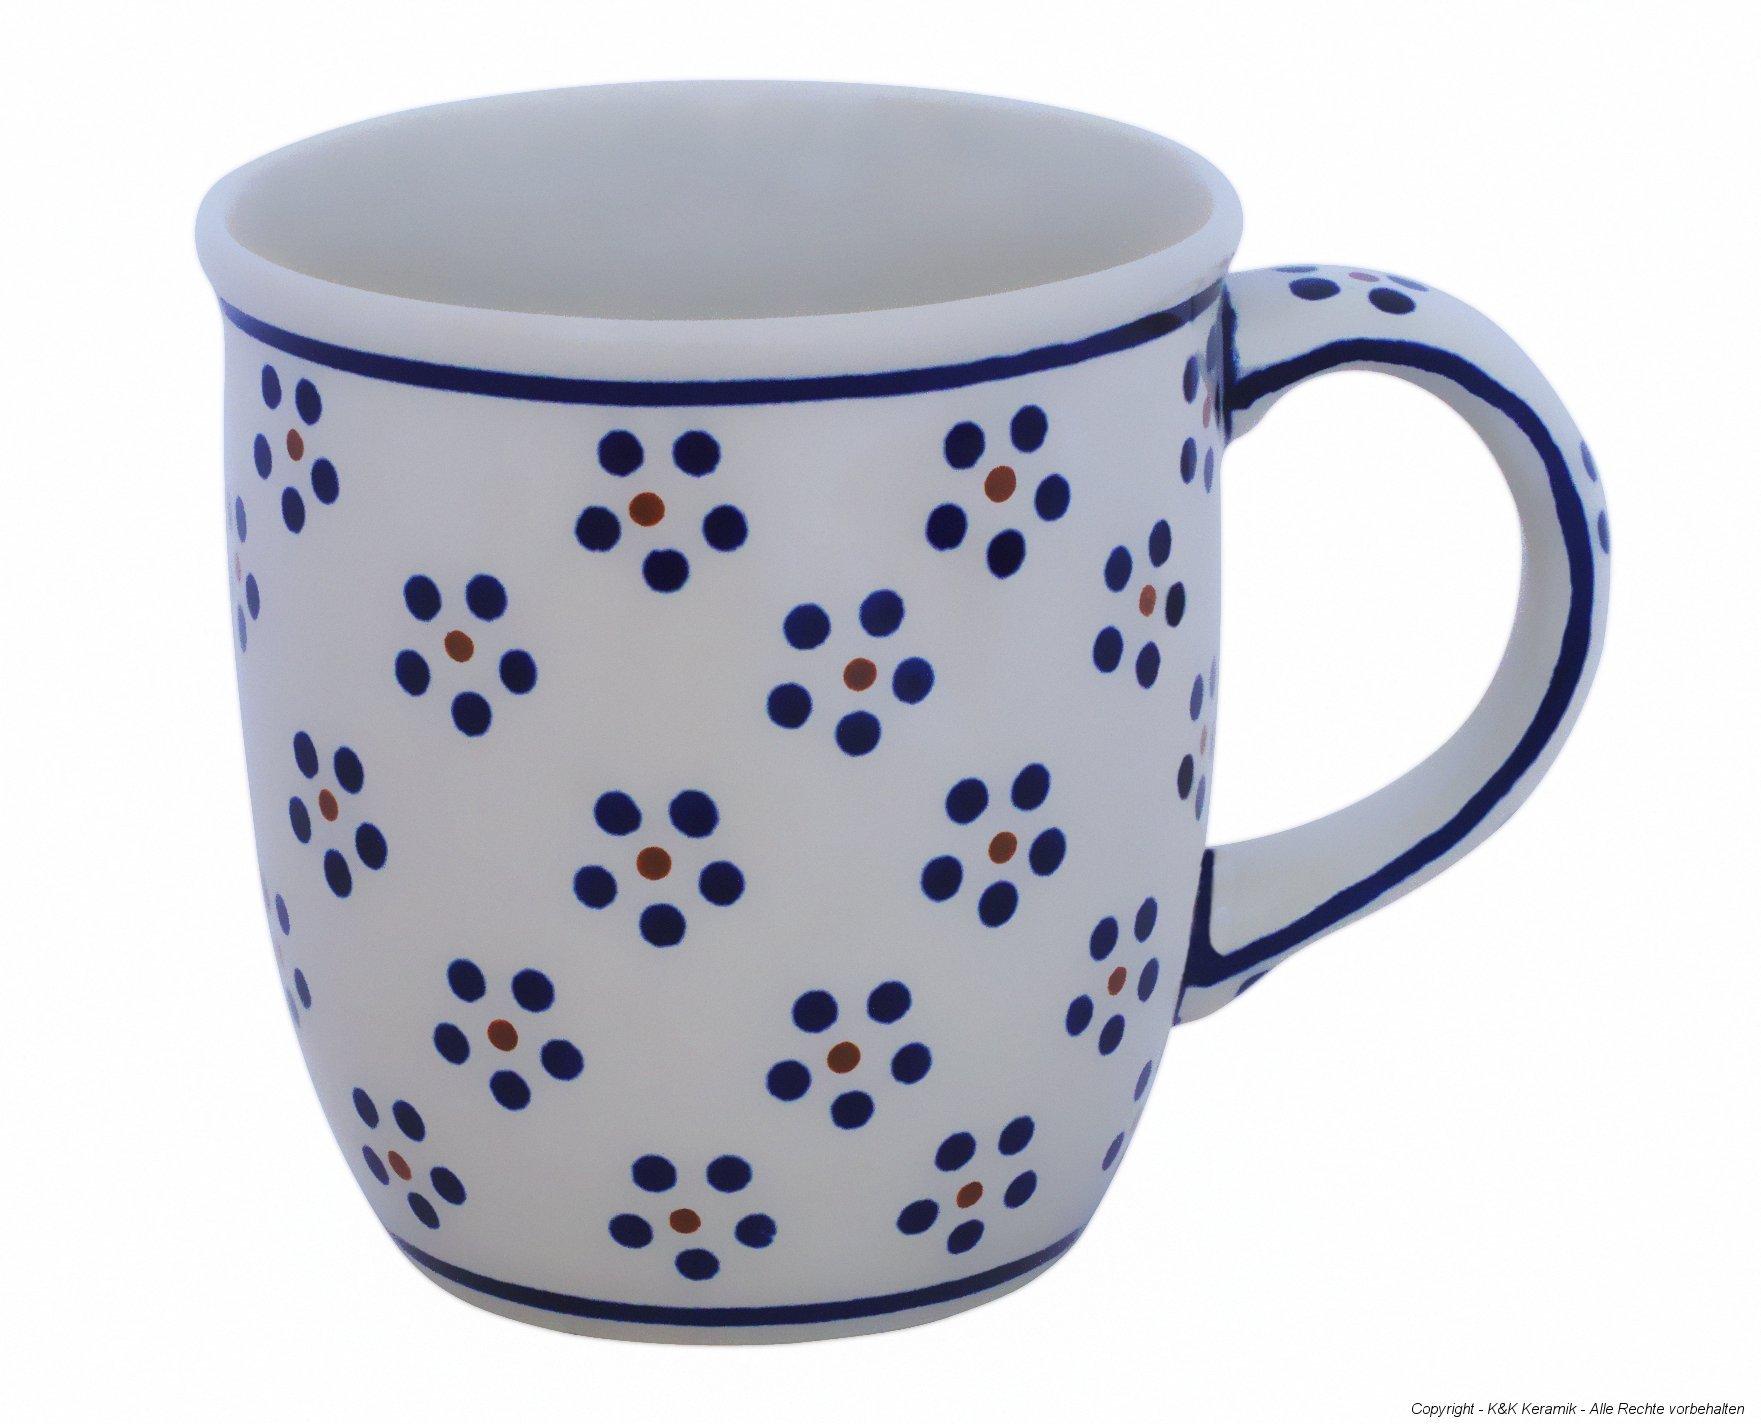 Boleslawiec Pottery Mug with round handles, 0.35 L, Original Bunzlauer Keramik, Decor 1